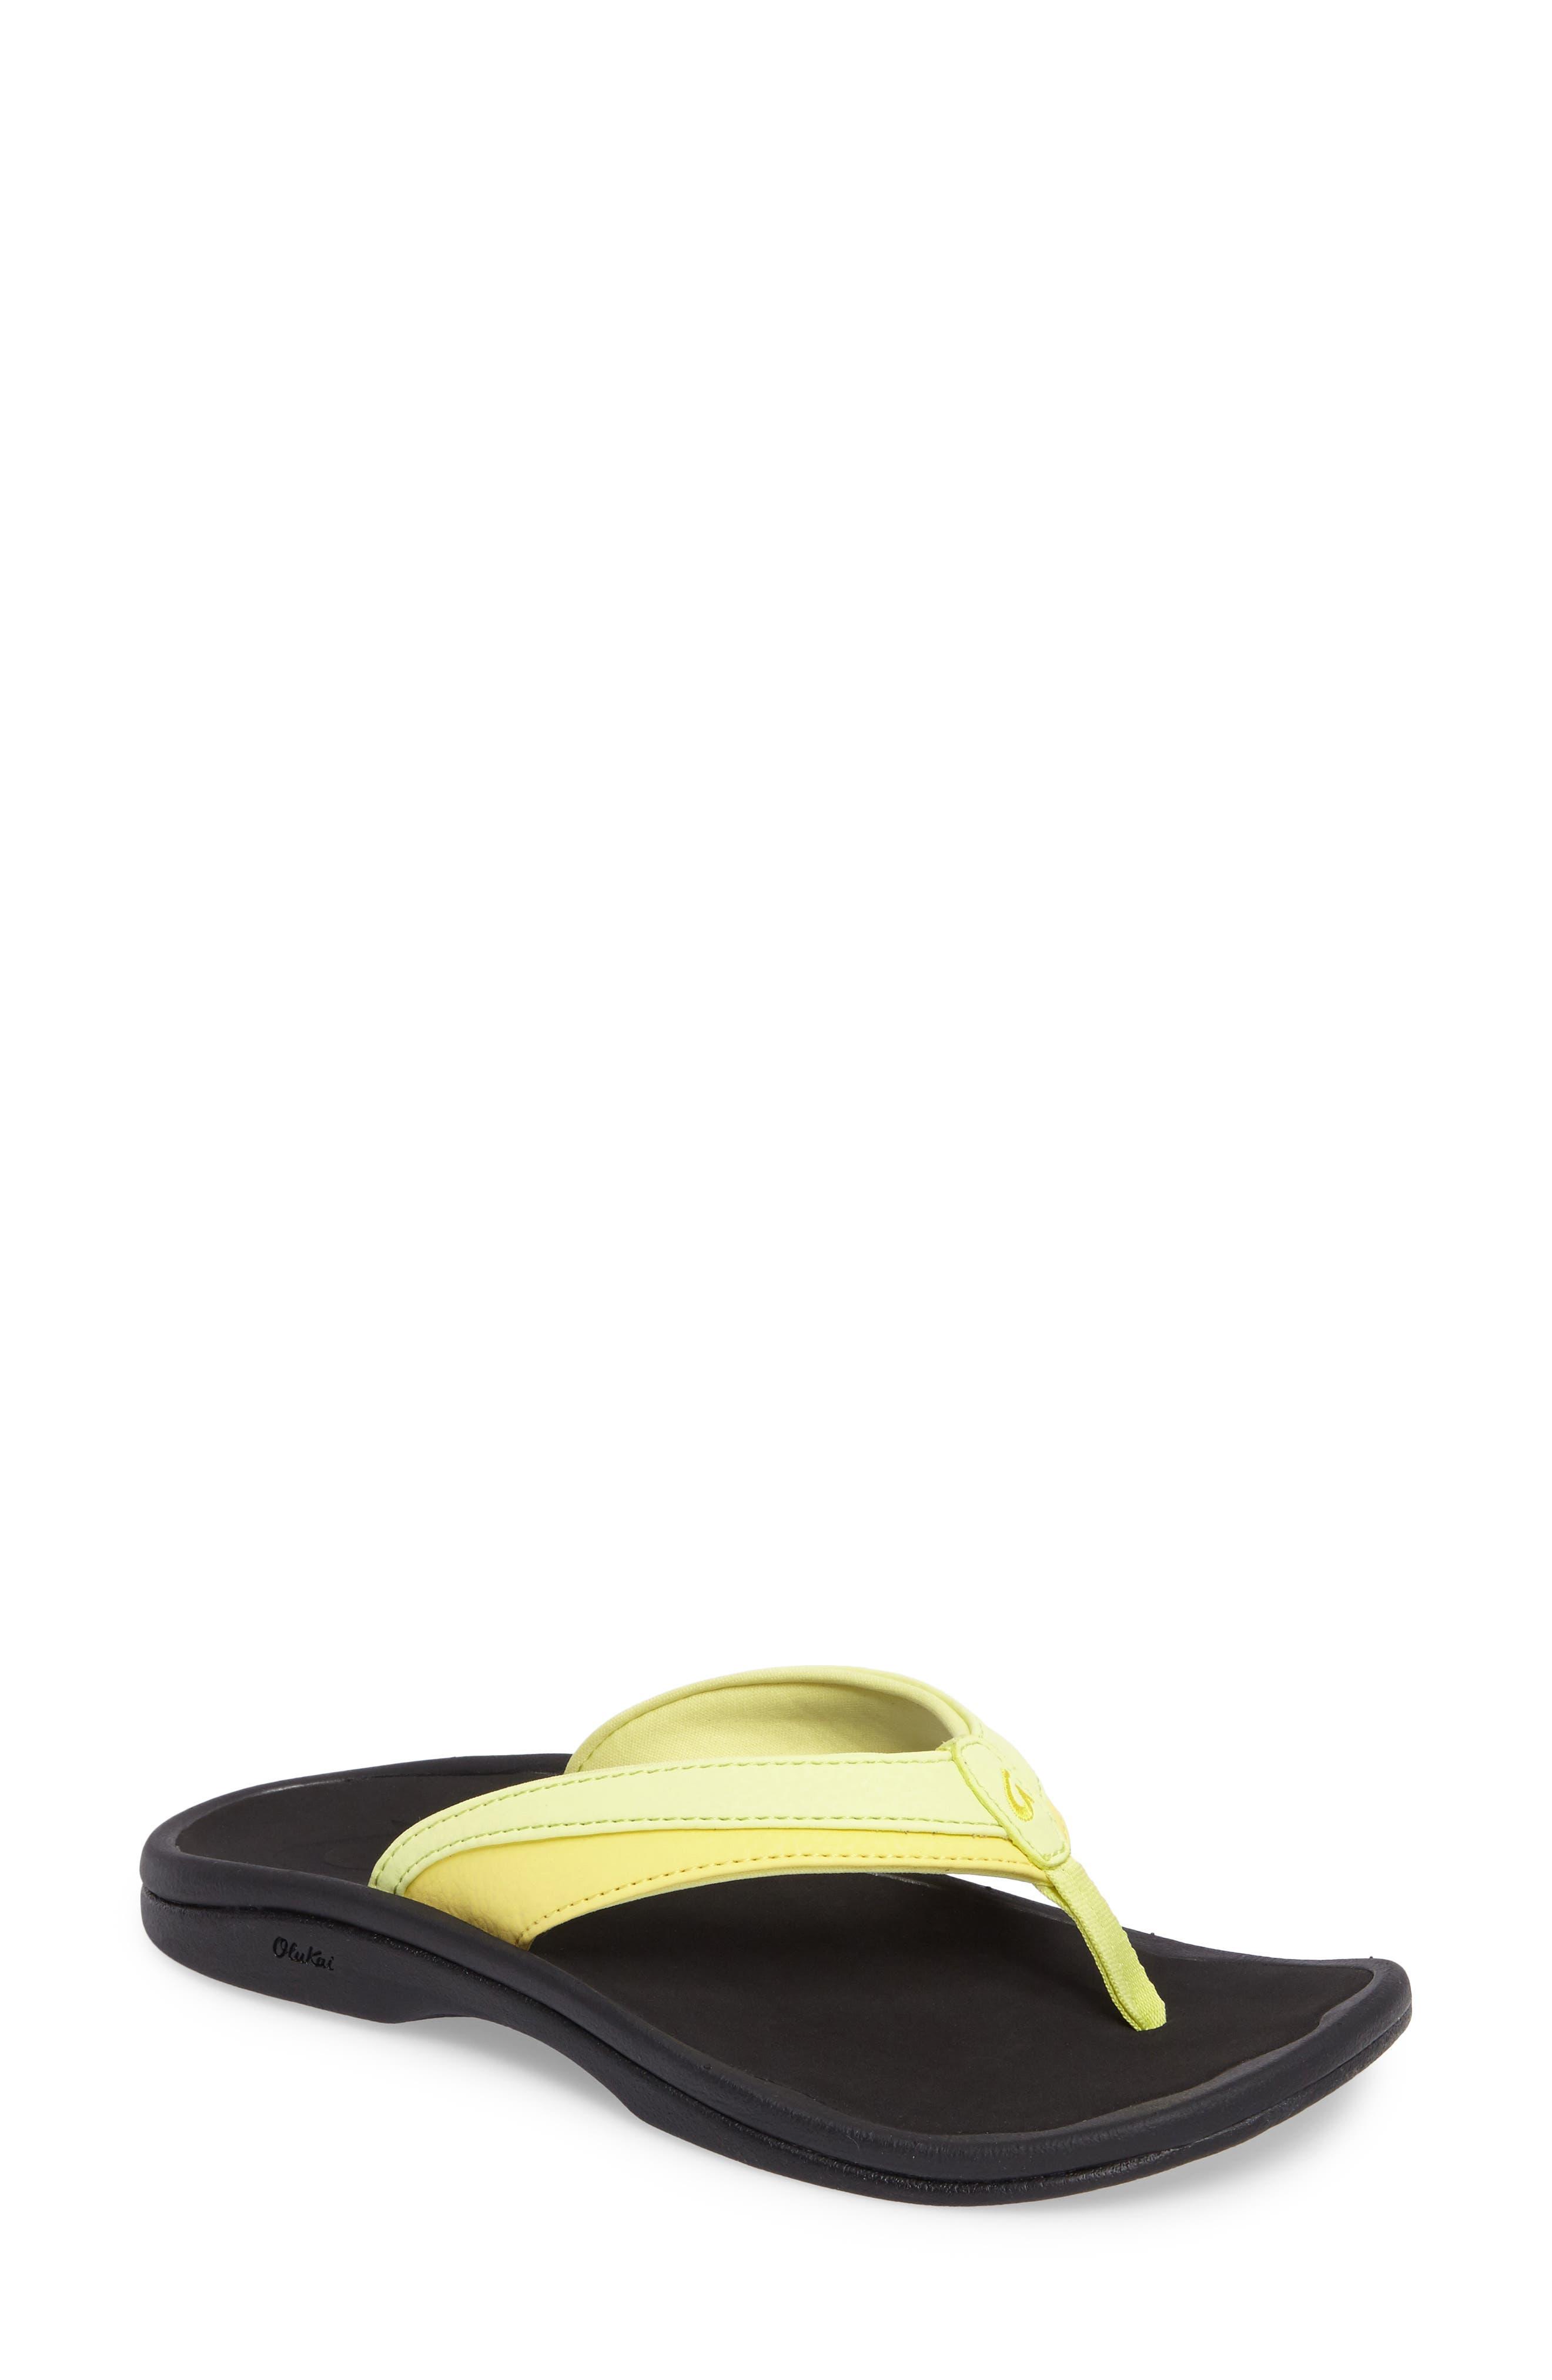 Alternate Image 1 Selected - OluKai 'Ohana' Sandal (Women)